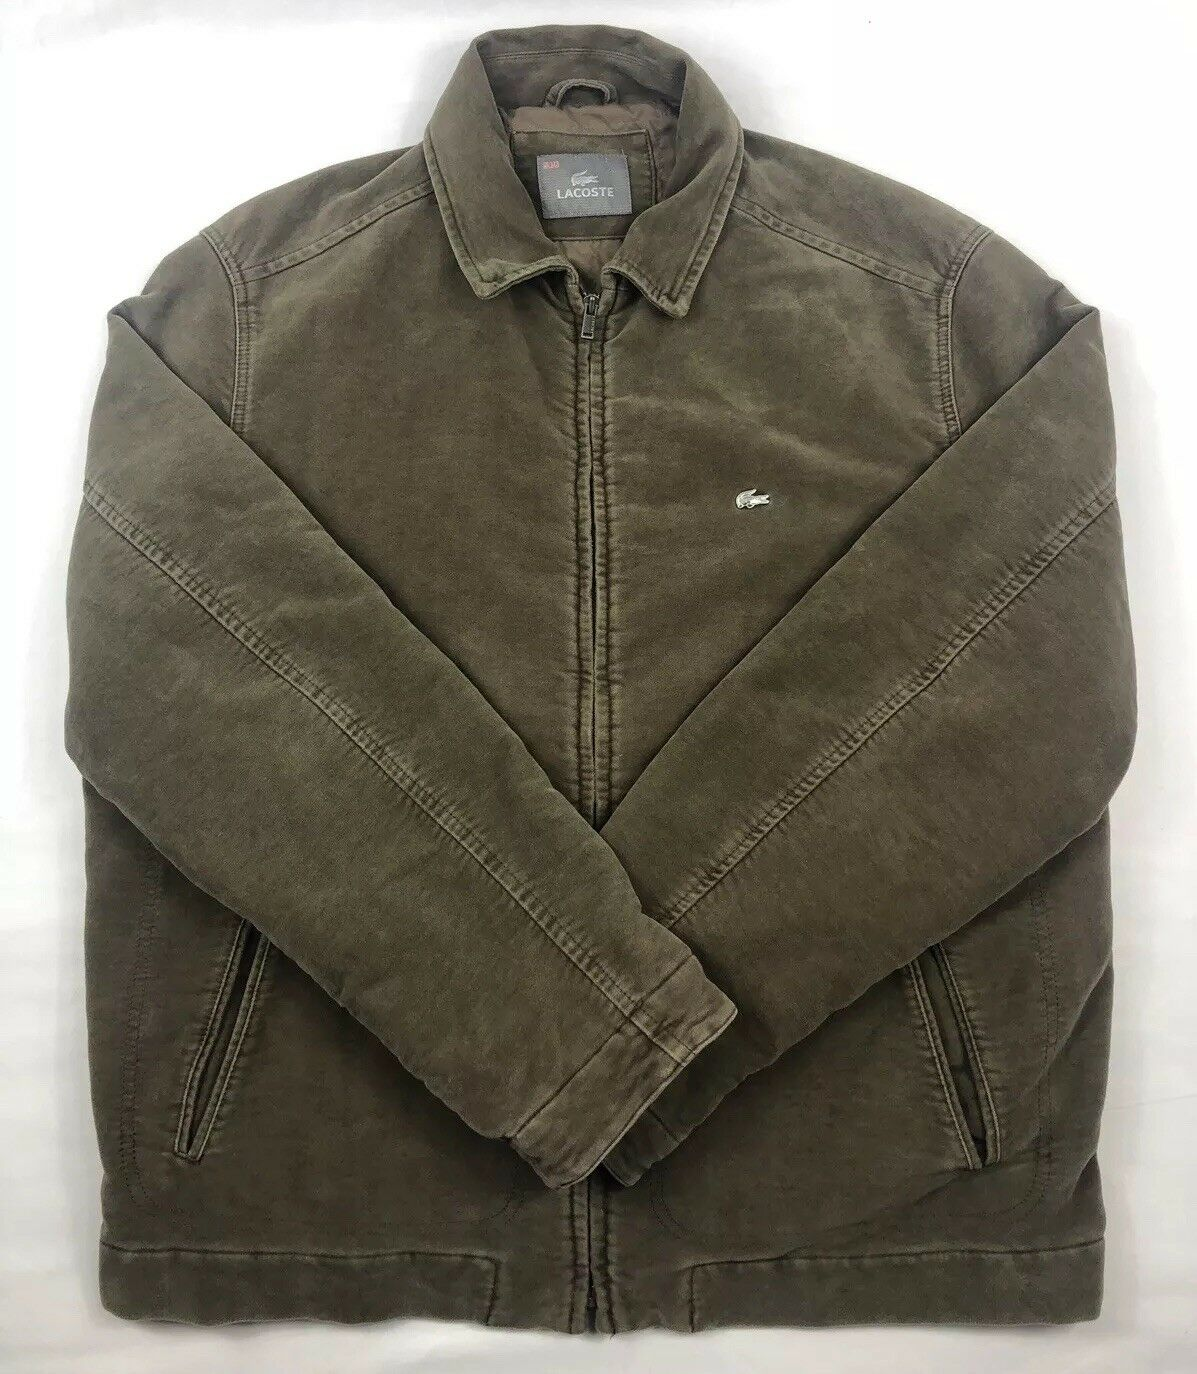 Lacoste Brown Heavyweight 100% Cotton Quilt Lined Full Zip Metal Croc XL EUC